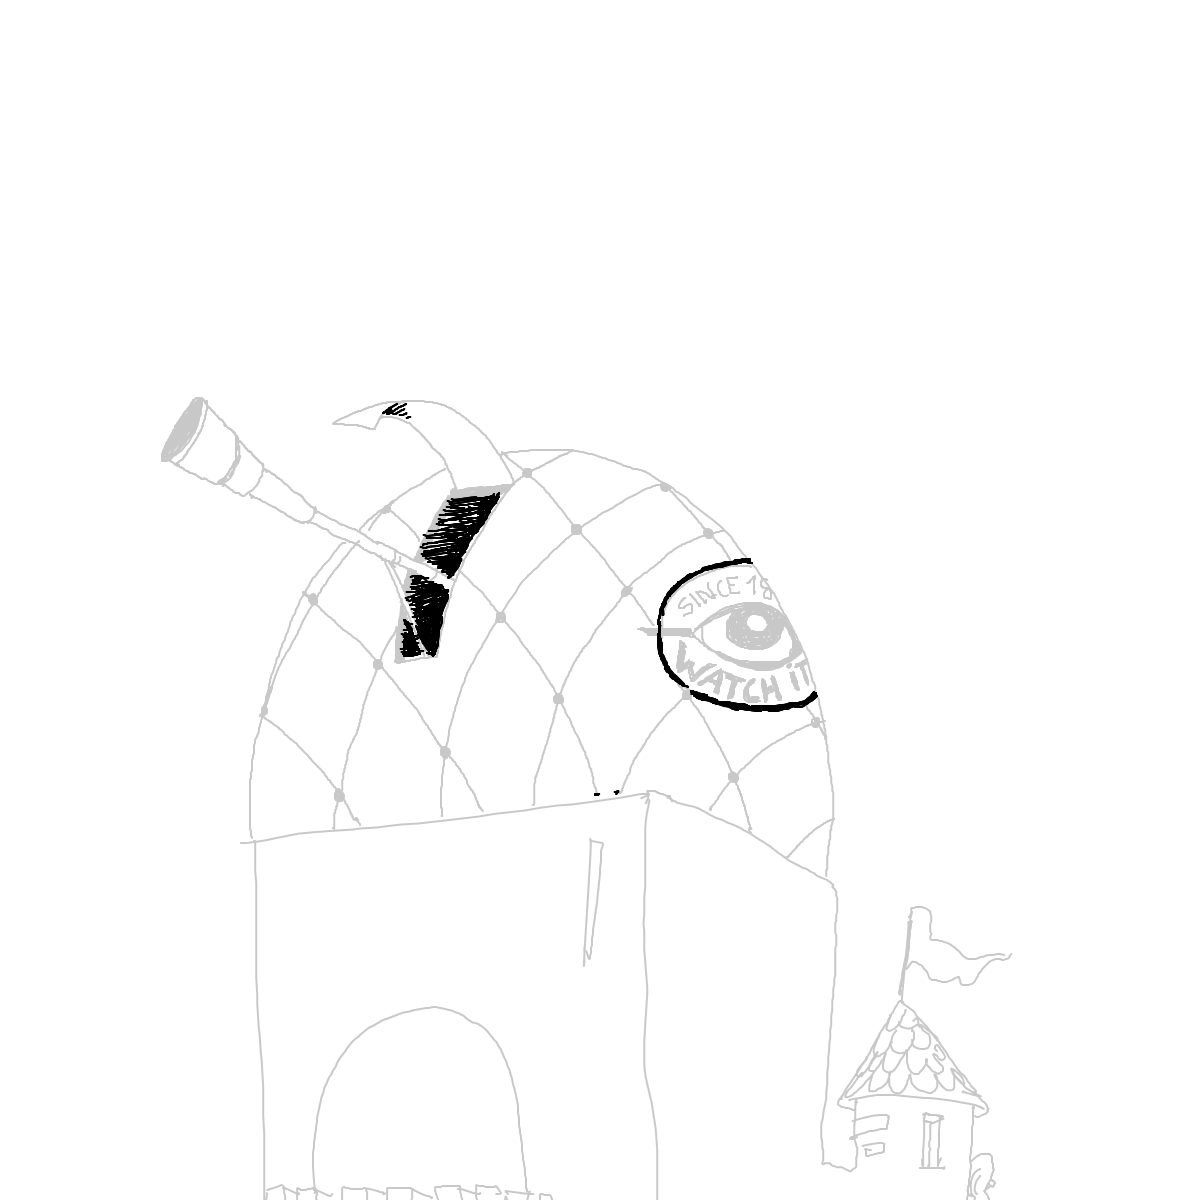 BAAAM drawing#3790 lat:78.4176025390625000lng: -4.4395356178283690